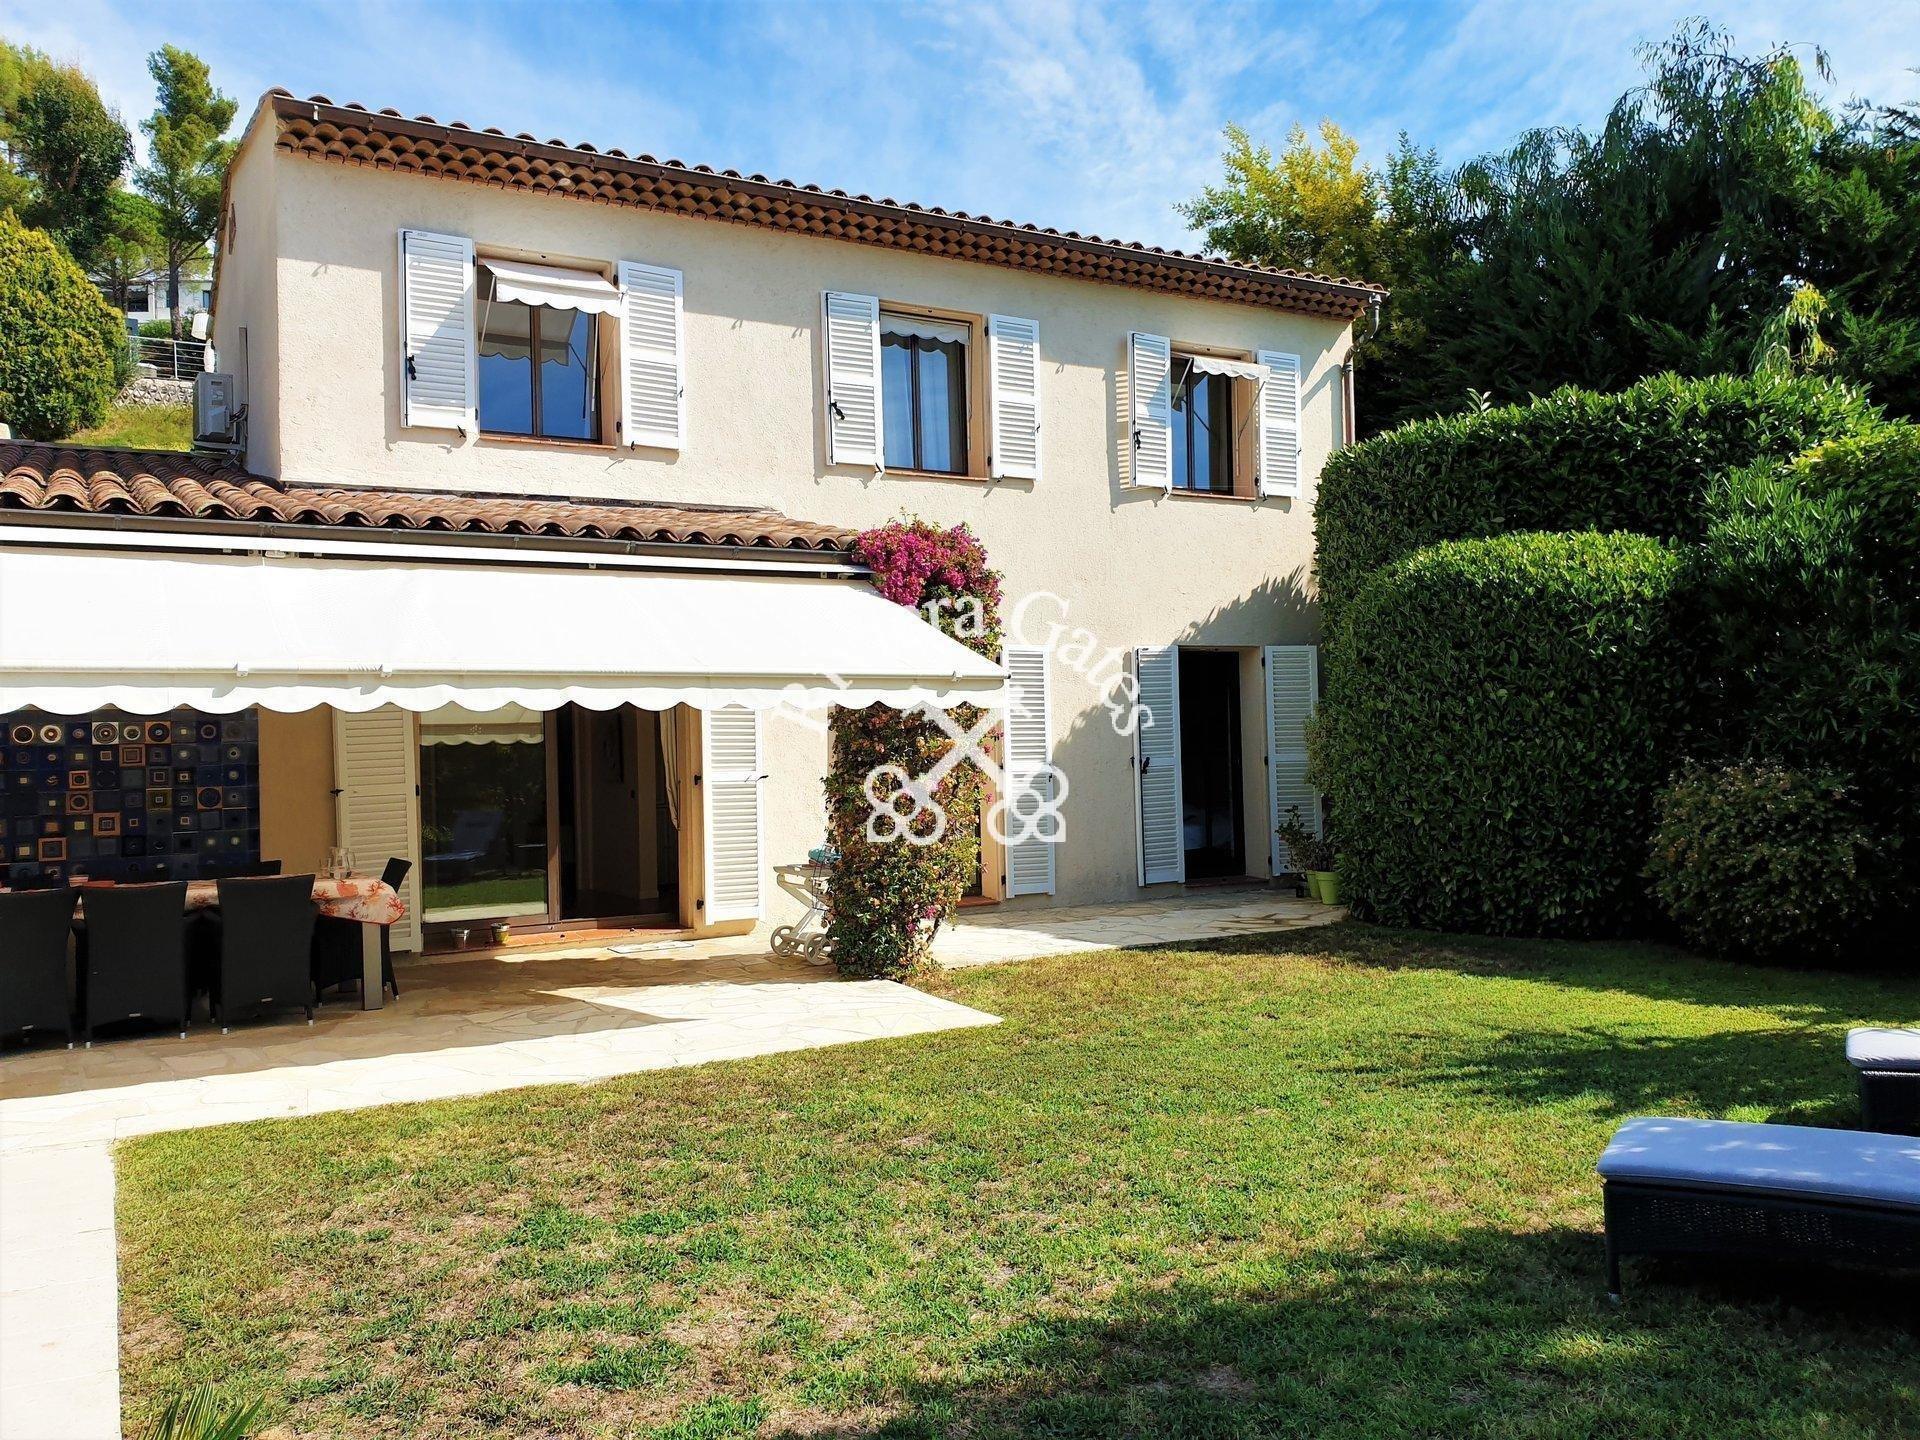 Zu vermieten - Unabhängige Villa mit Swimmingpool - Les Hauts de Vaugrenier